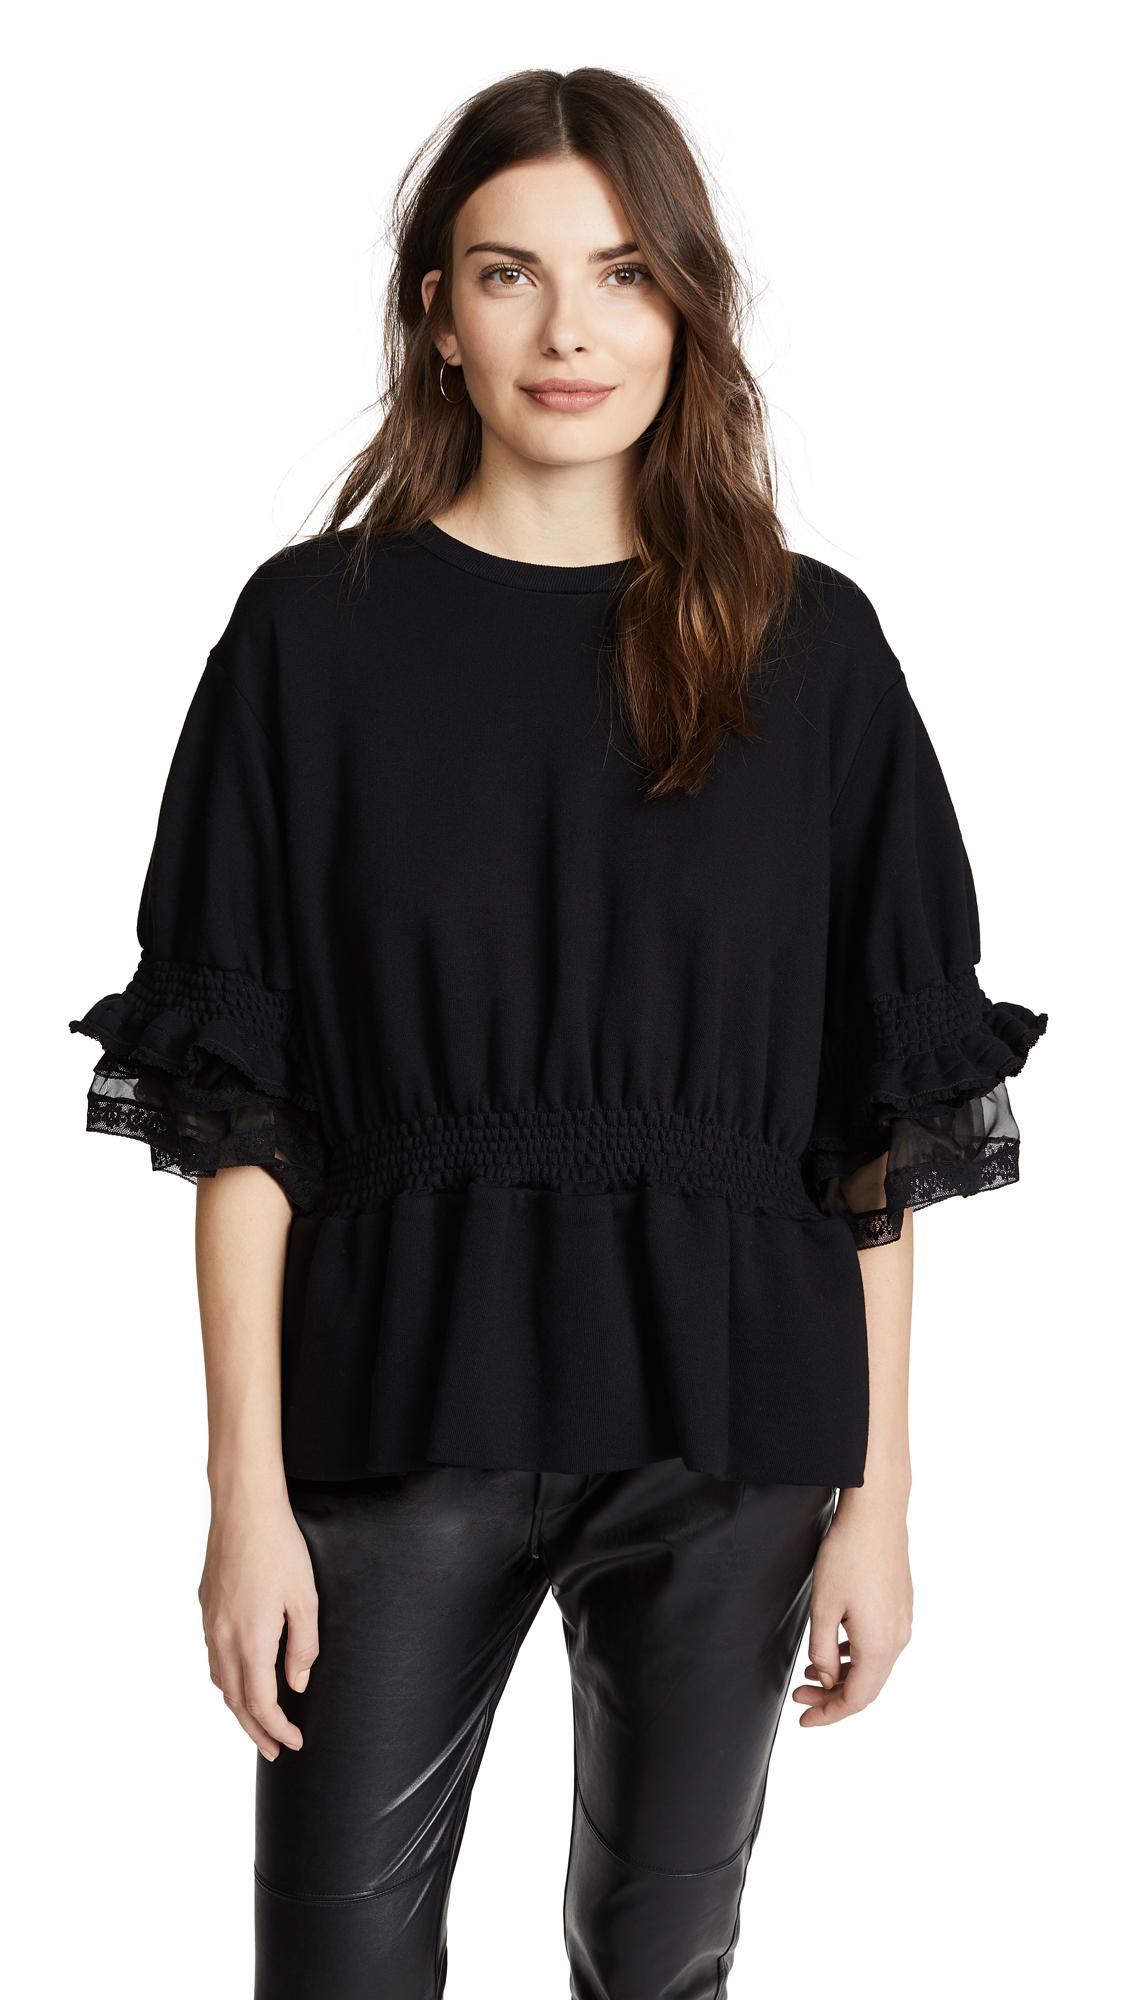 Preen By Thornton Bregazzi Scarlet Sweatshirt